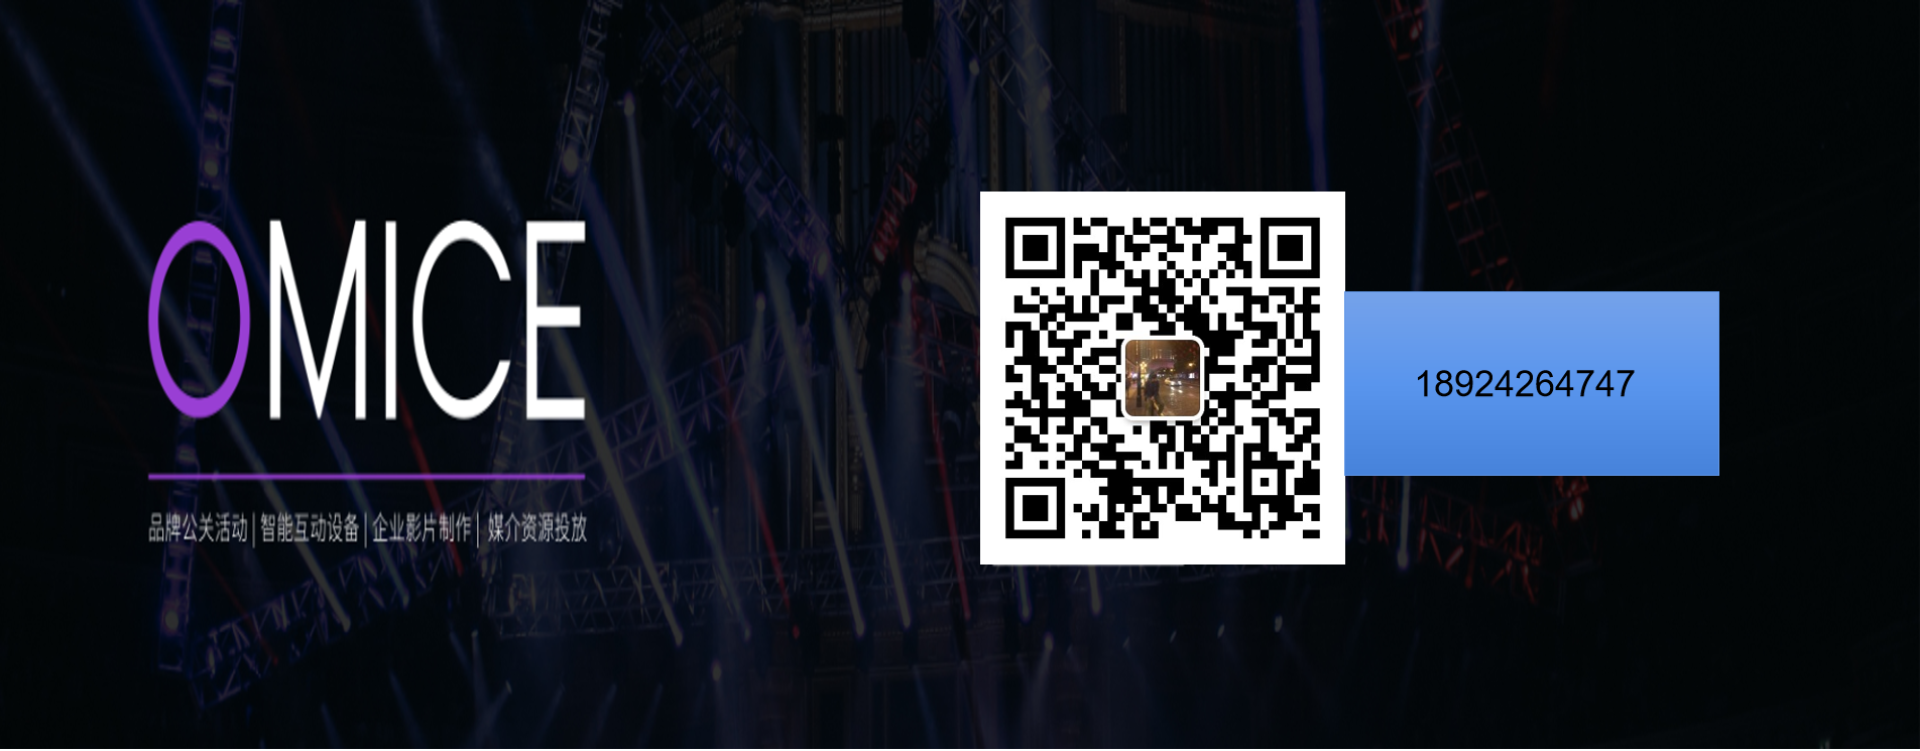 https://images.osogoo.com/user/5ce4da5b29b71/osogoo071414133794969.jpg